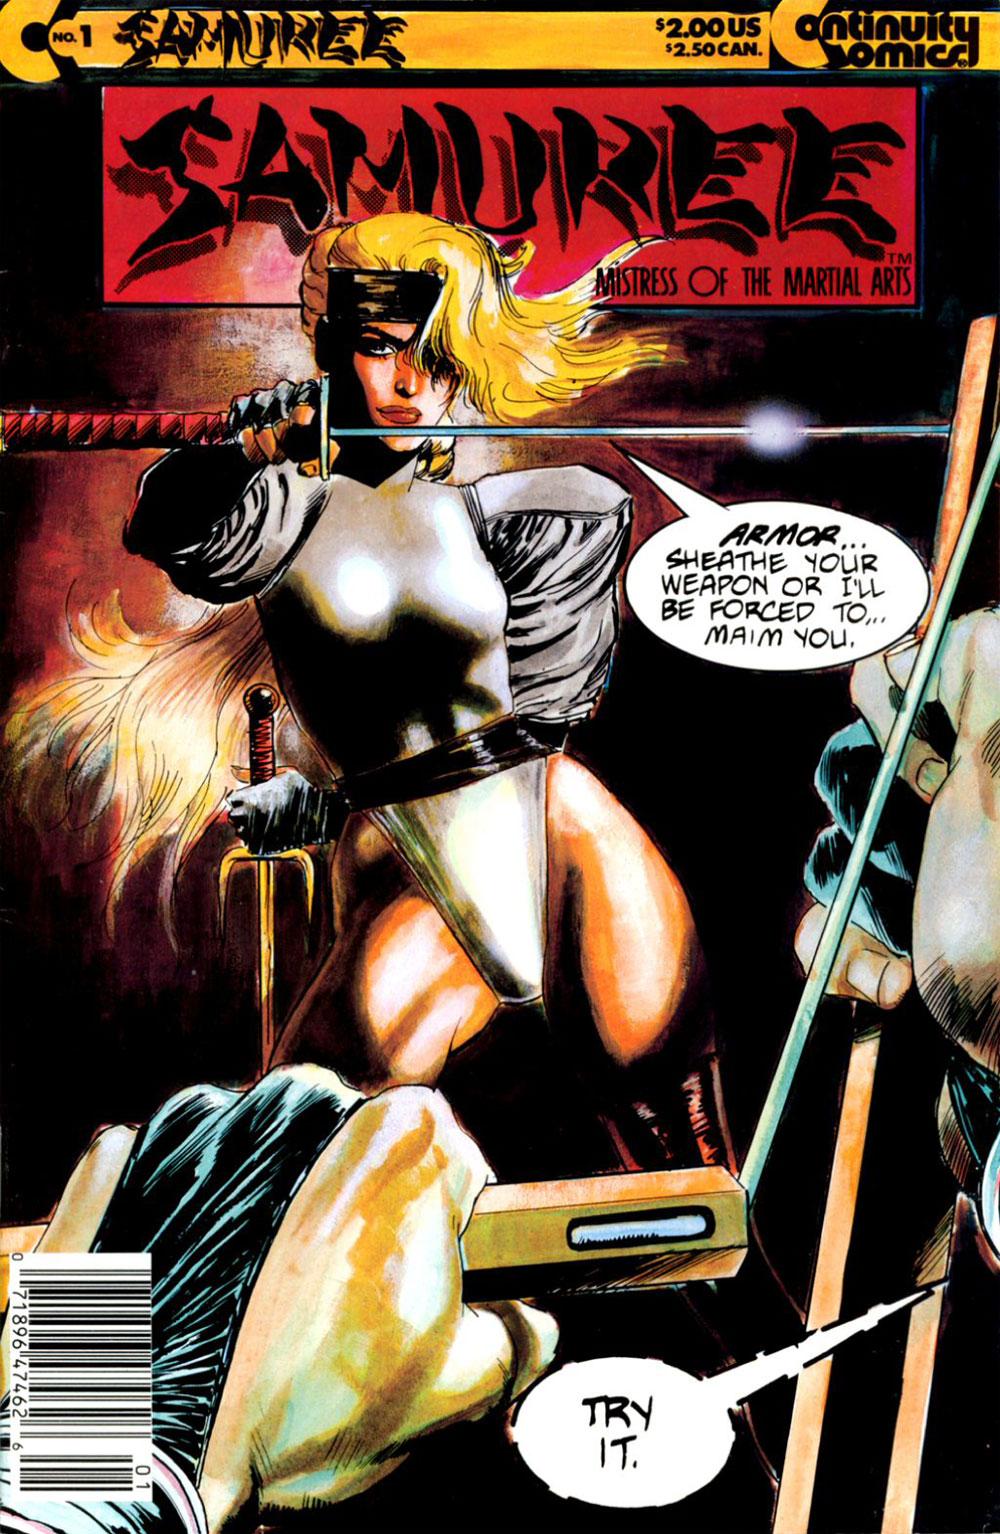 Reviews of Old Comics: Samuree #1